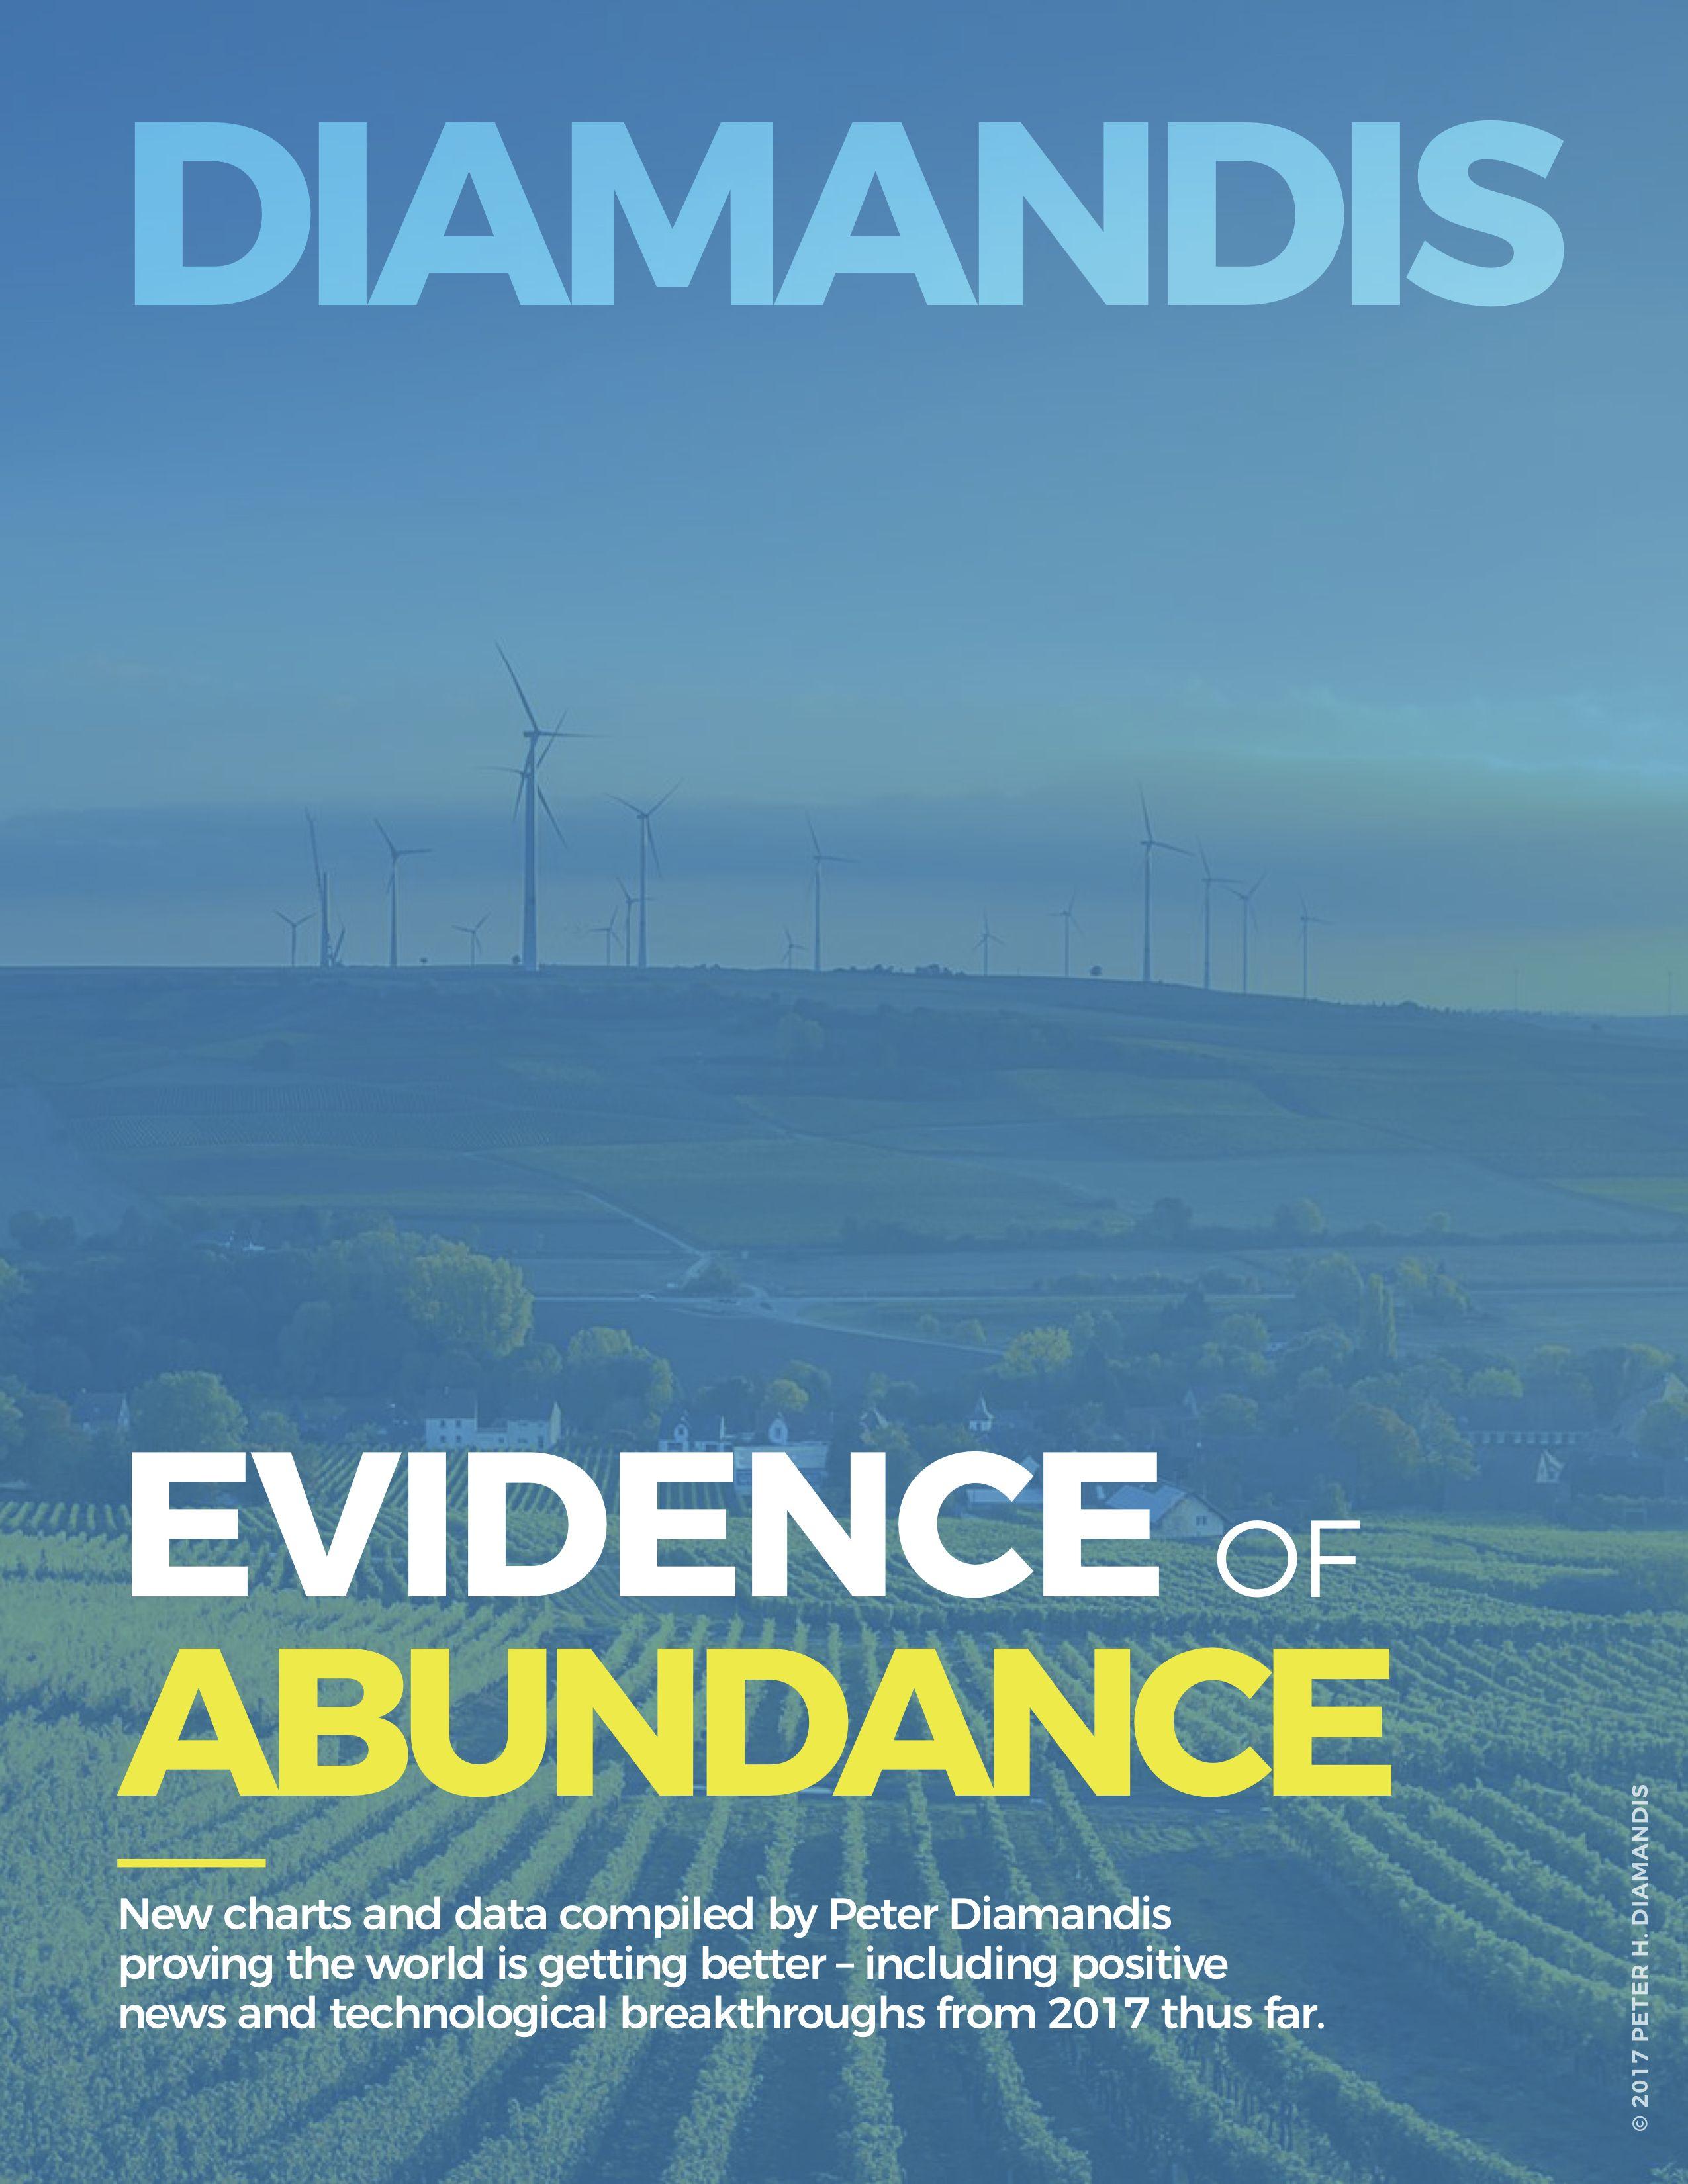 Peter diamandis evidence of abundance ebook positive